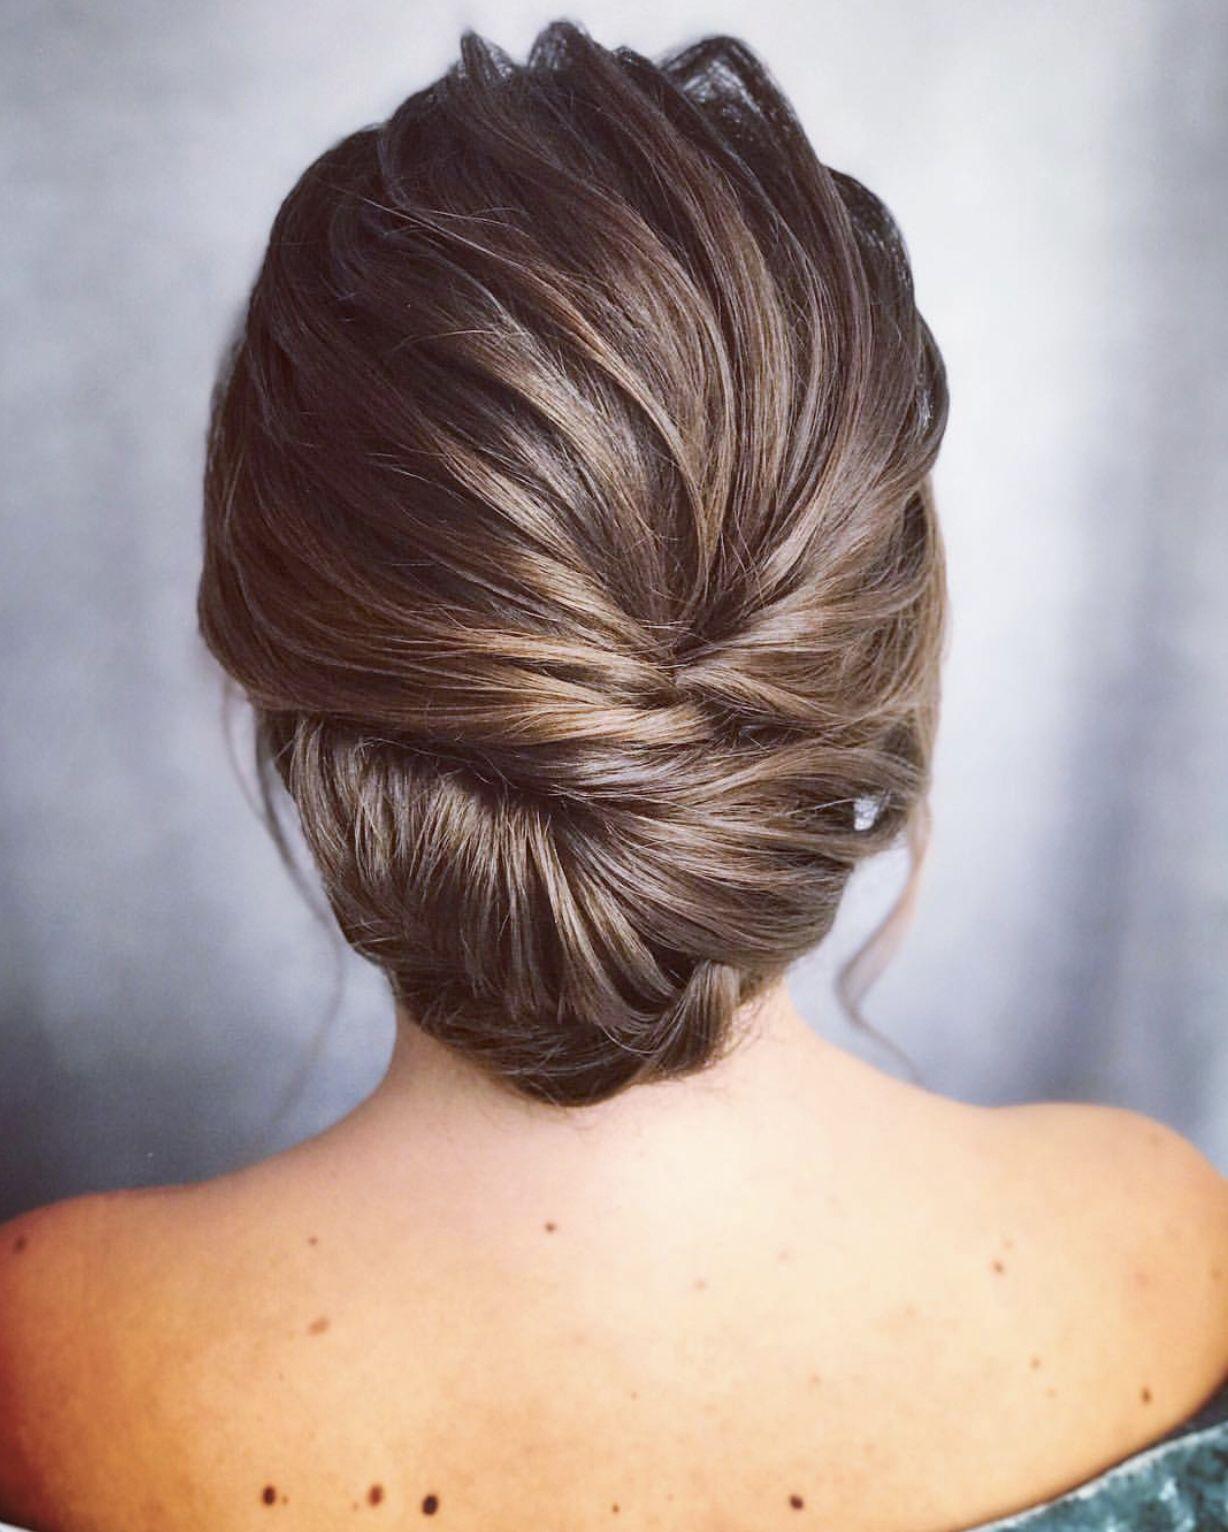 Wedding Hair Hair Styles Wedding Hair And Makeup Brunette Wedding Hair Up